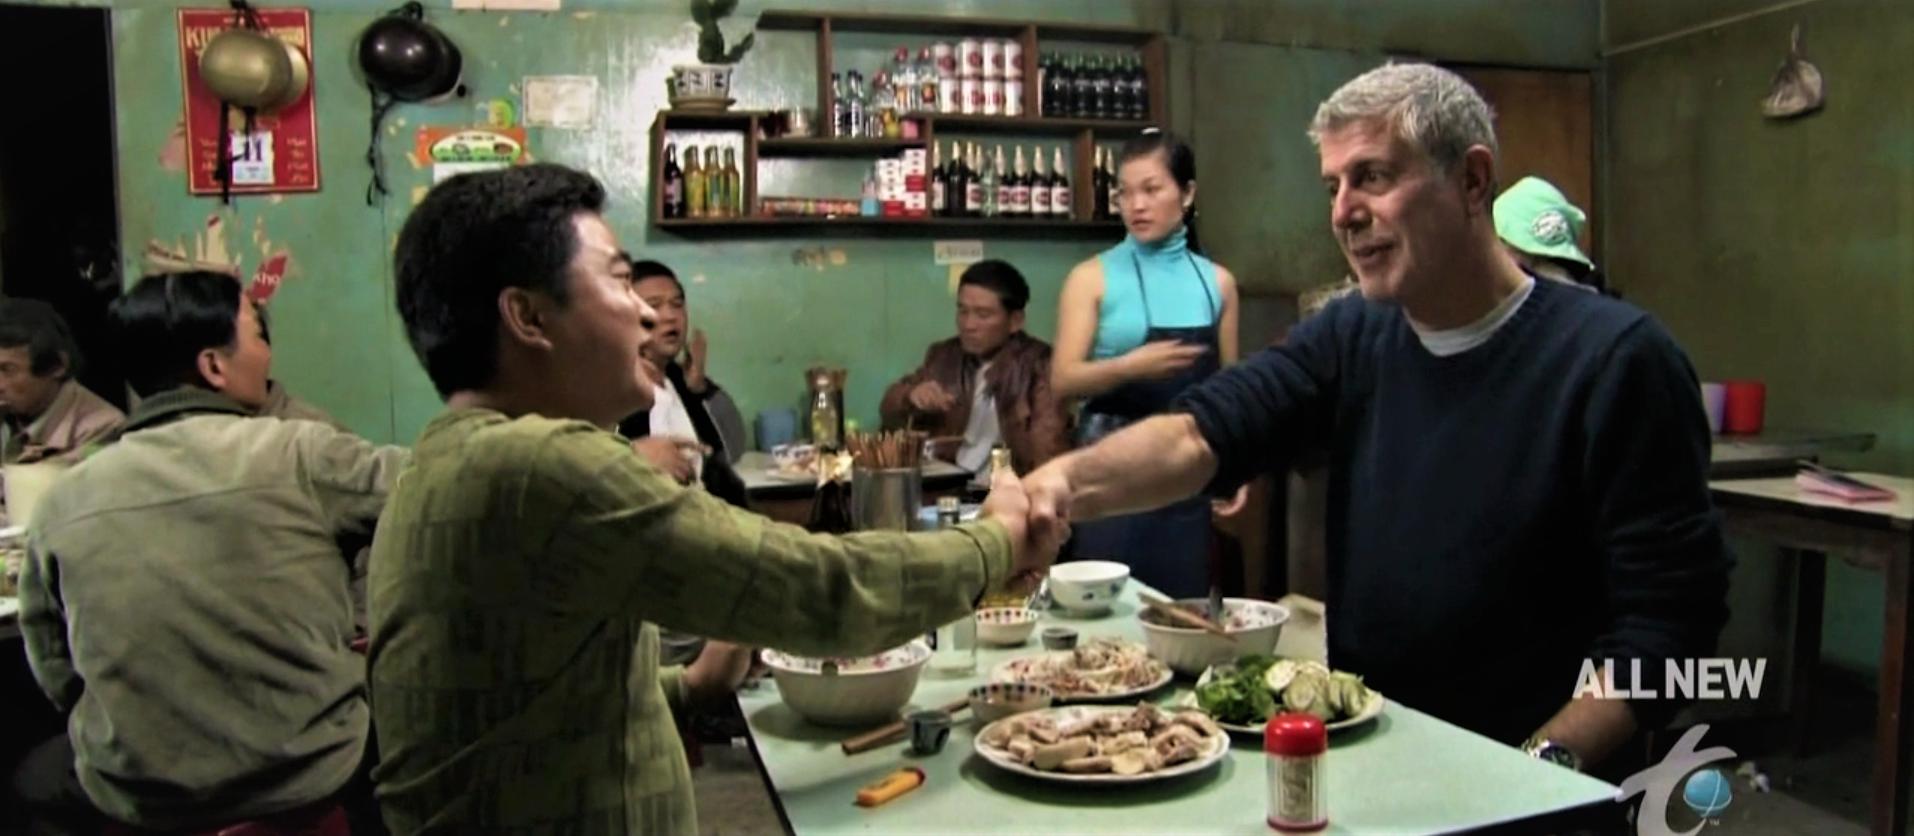 Anthony Bourdain, No Reservations, Season 6 Episode 10, Dalat, Vietnam